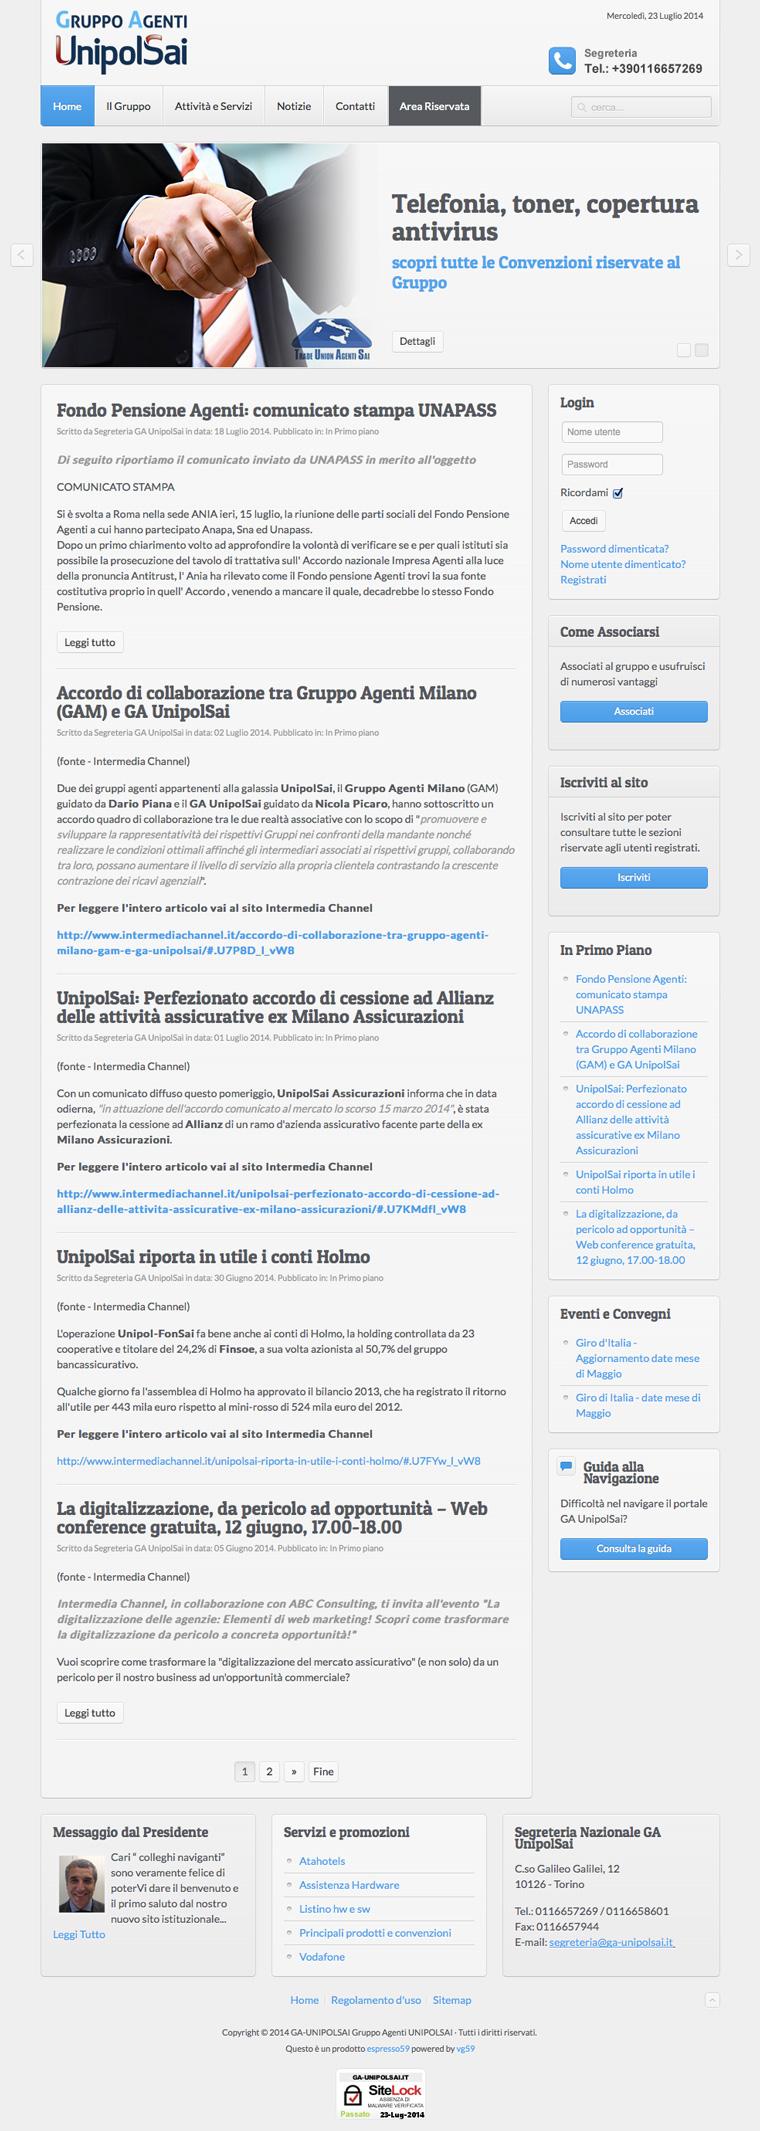 Gruppo Agenti Unipol Sai-1